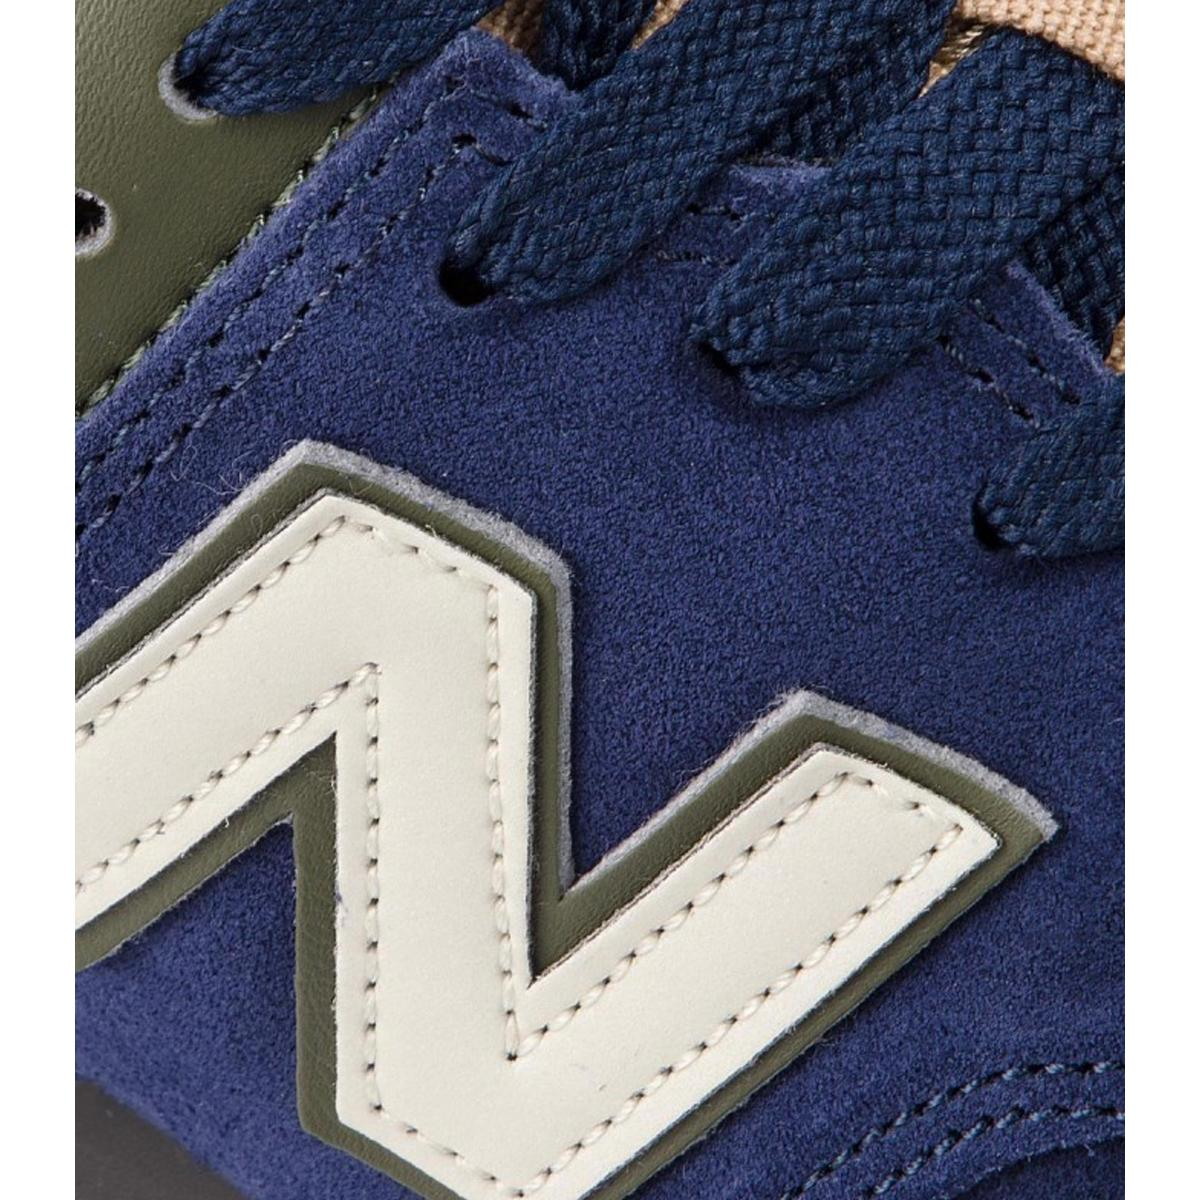 Scarpe Sneakers New Balance da uomo rif. ML574HVA